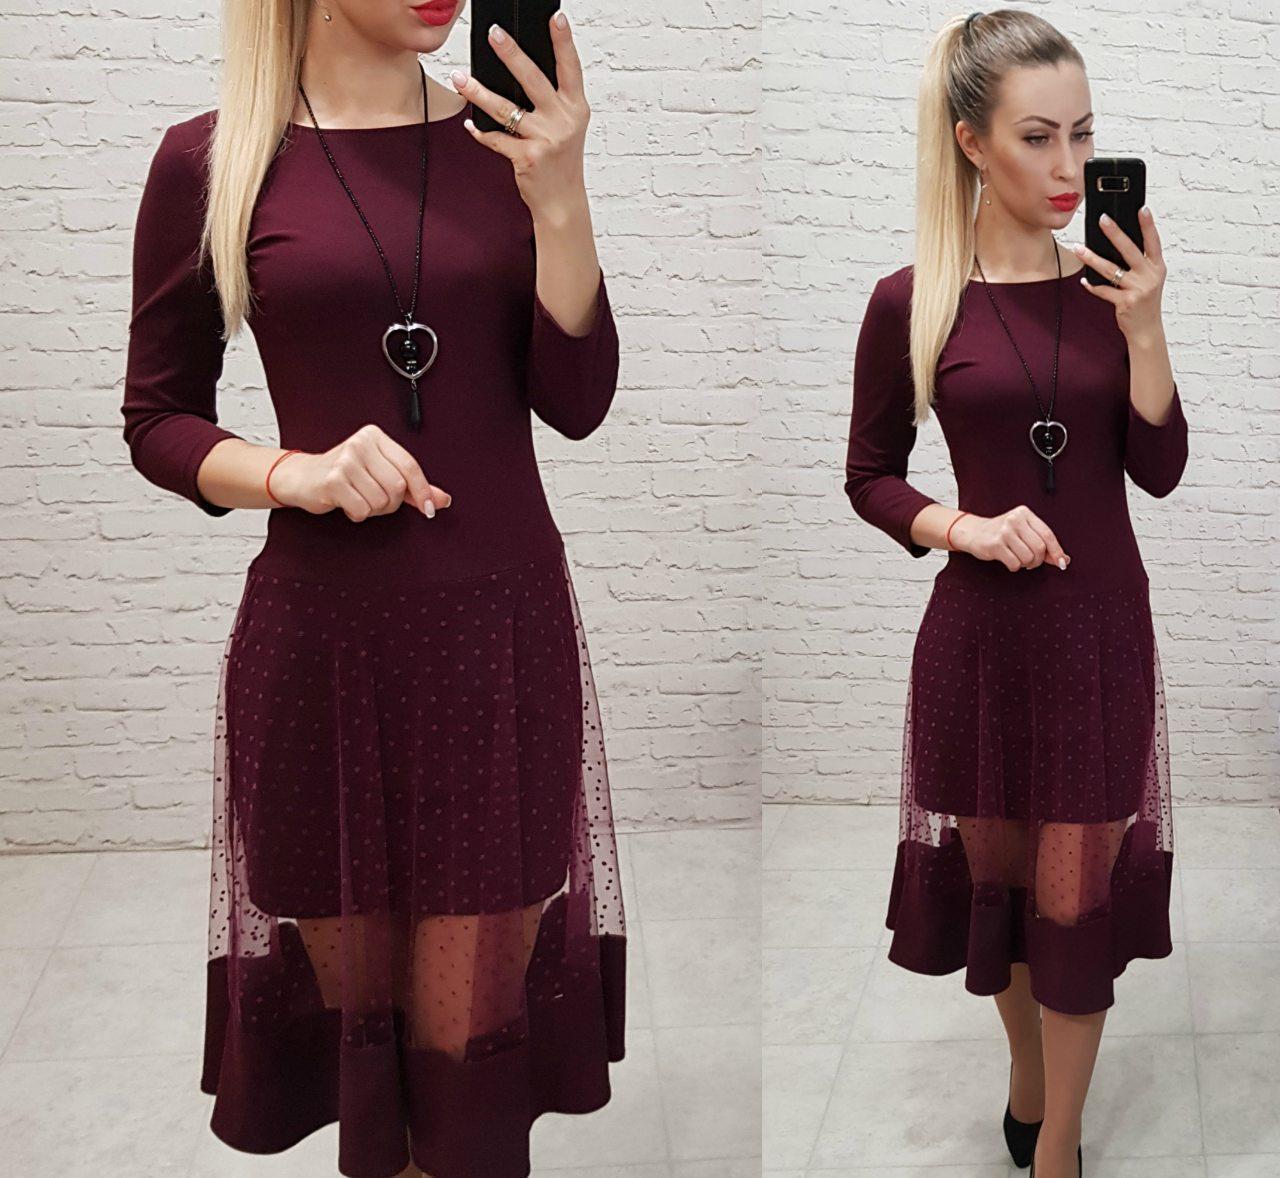 Платье люкс, арт 146,ткань креп дайвинг, цвет бордо